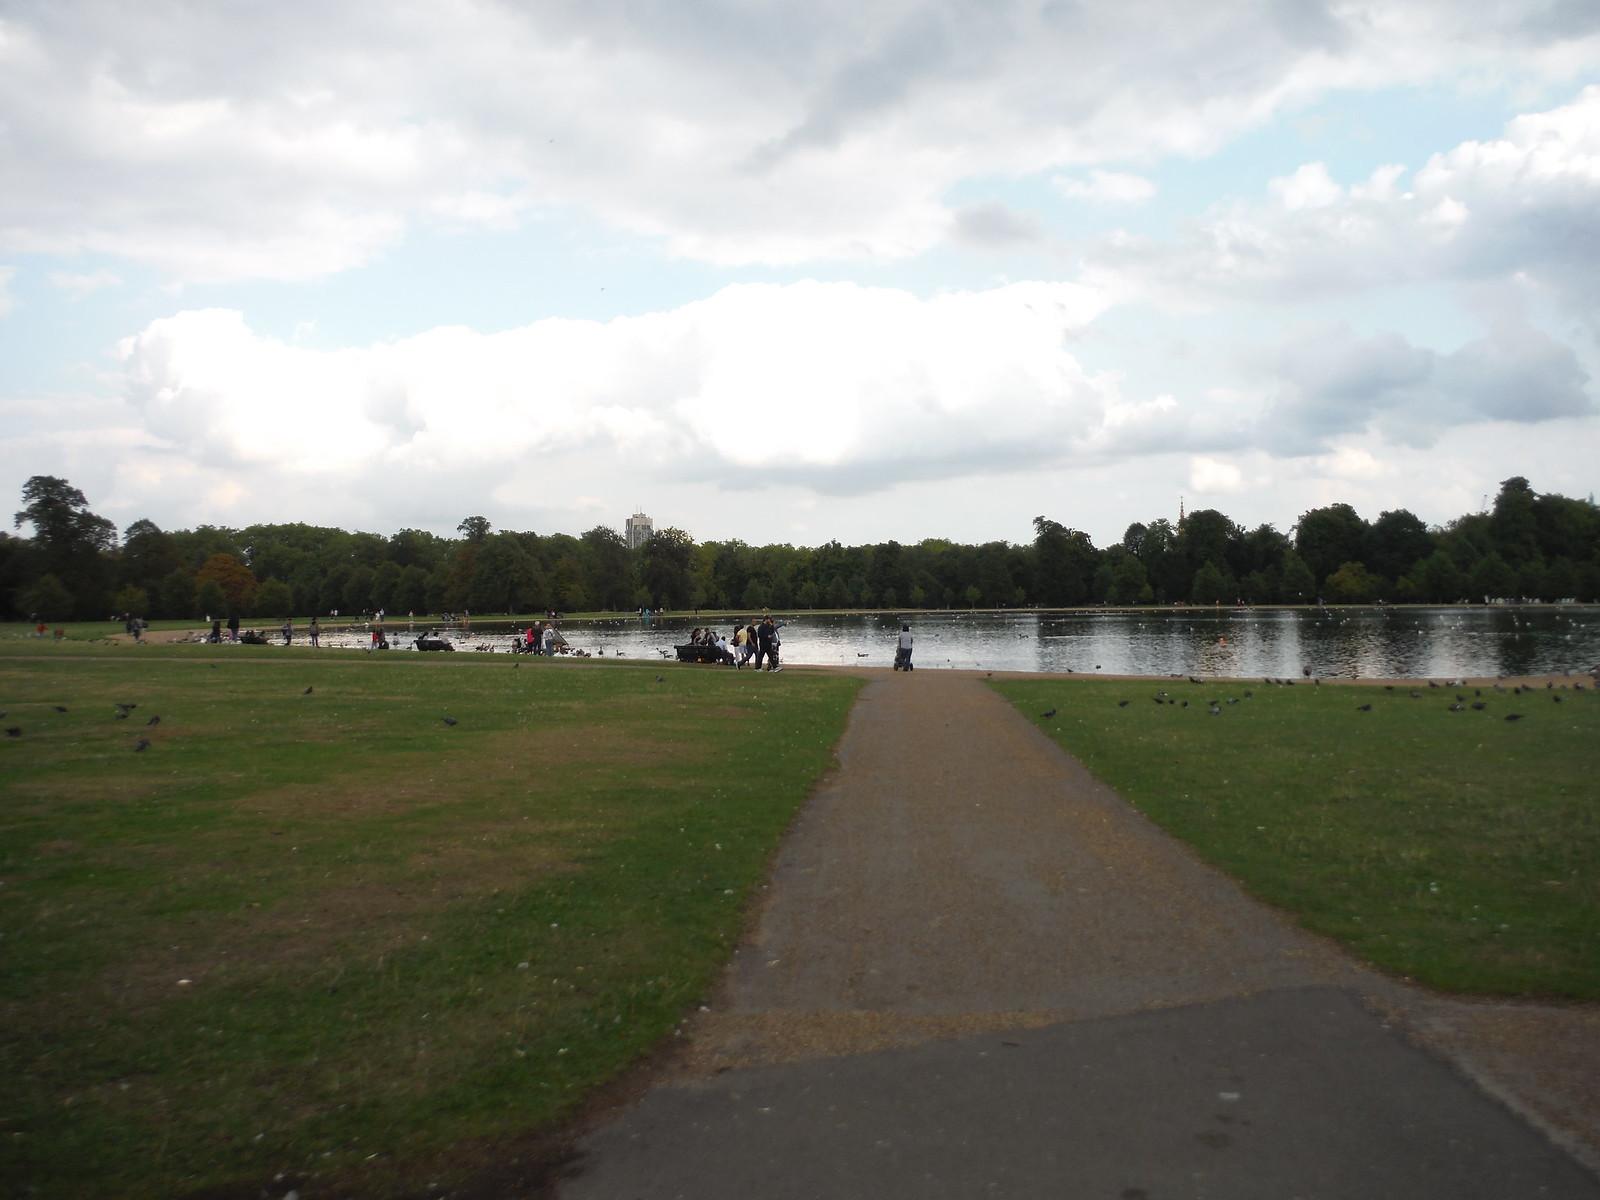 Round Pond, Kensington Gardens SWC Short Walk 19 - Royal Parks